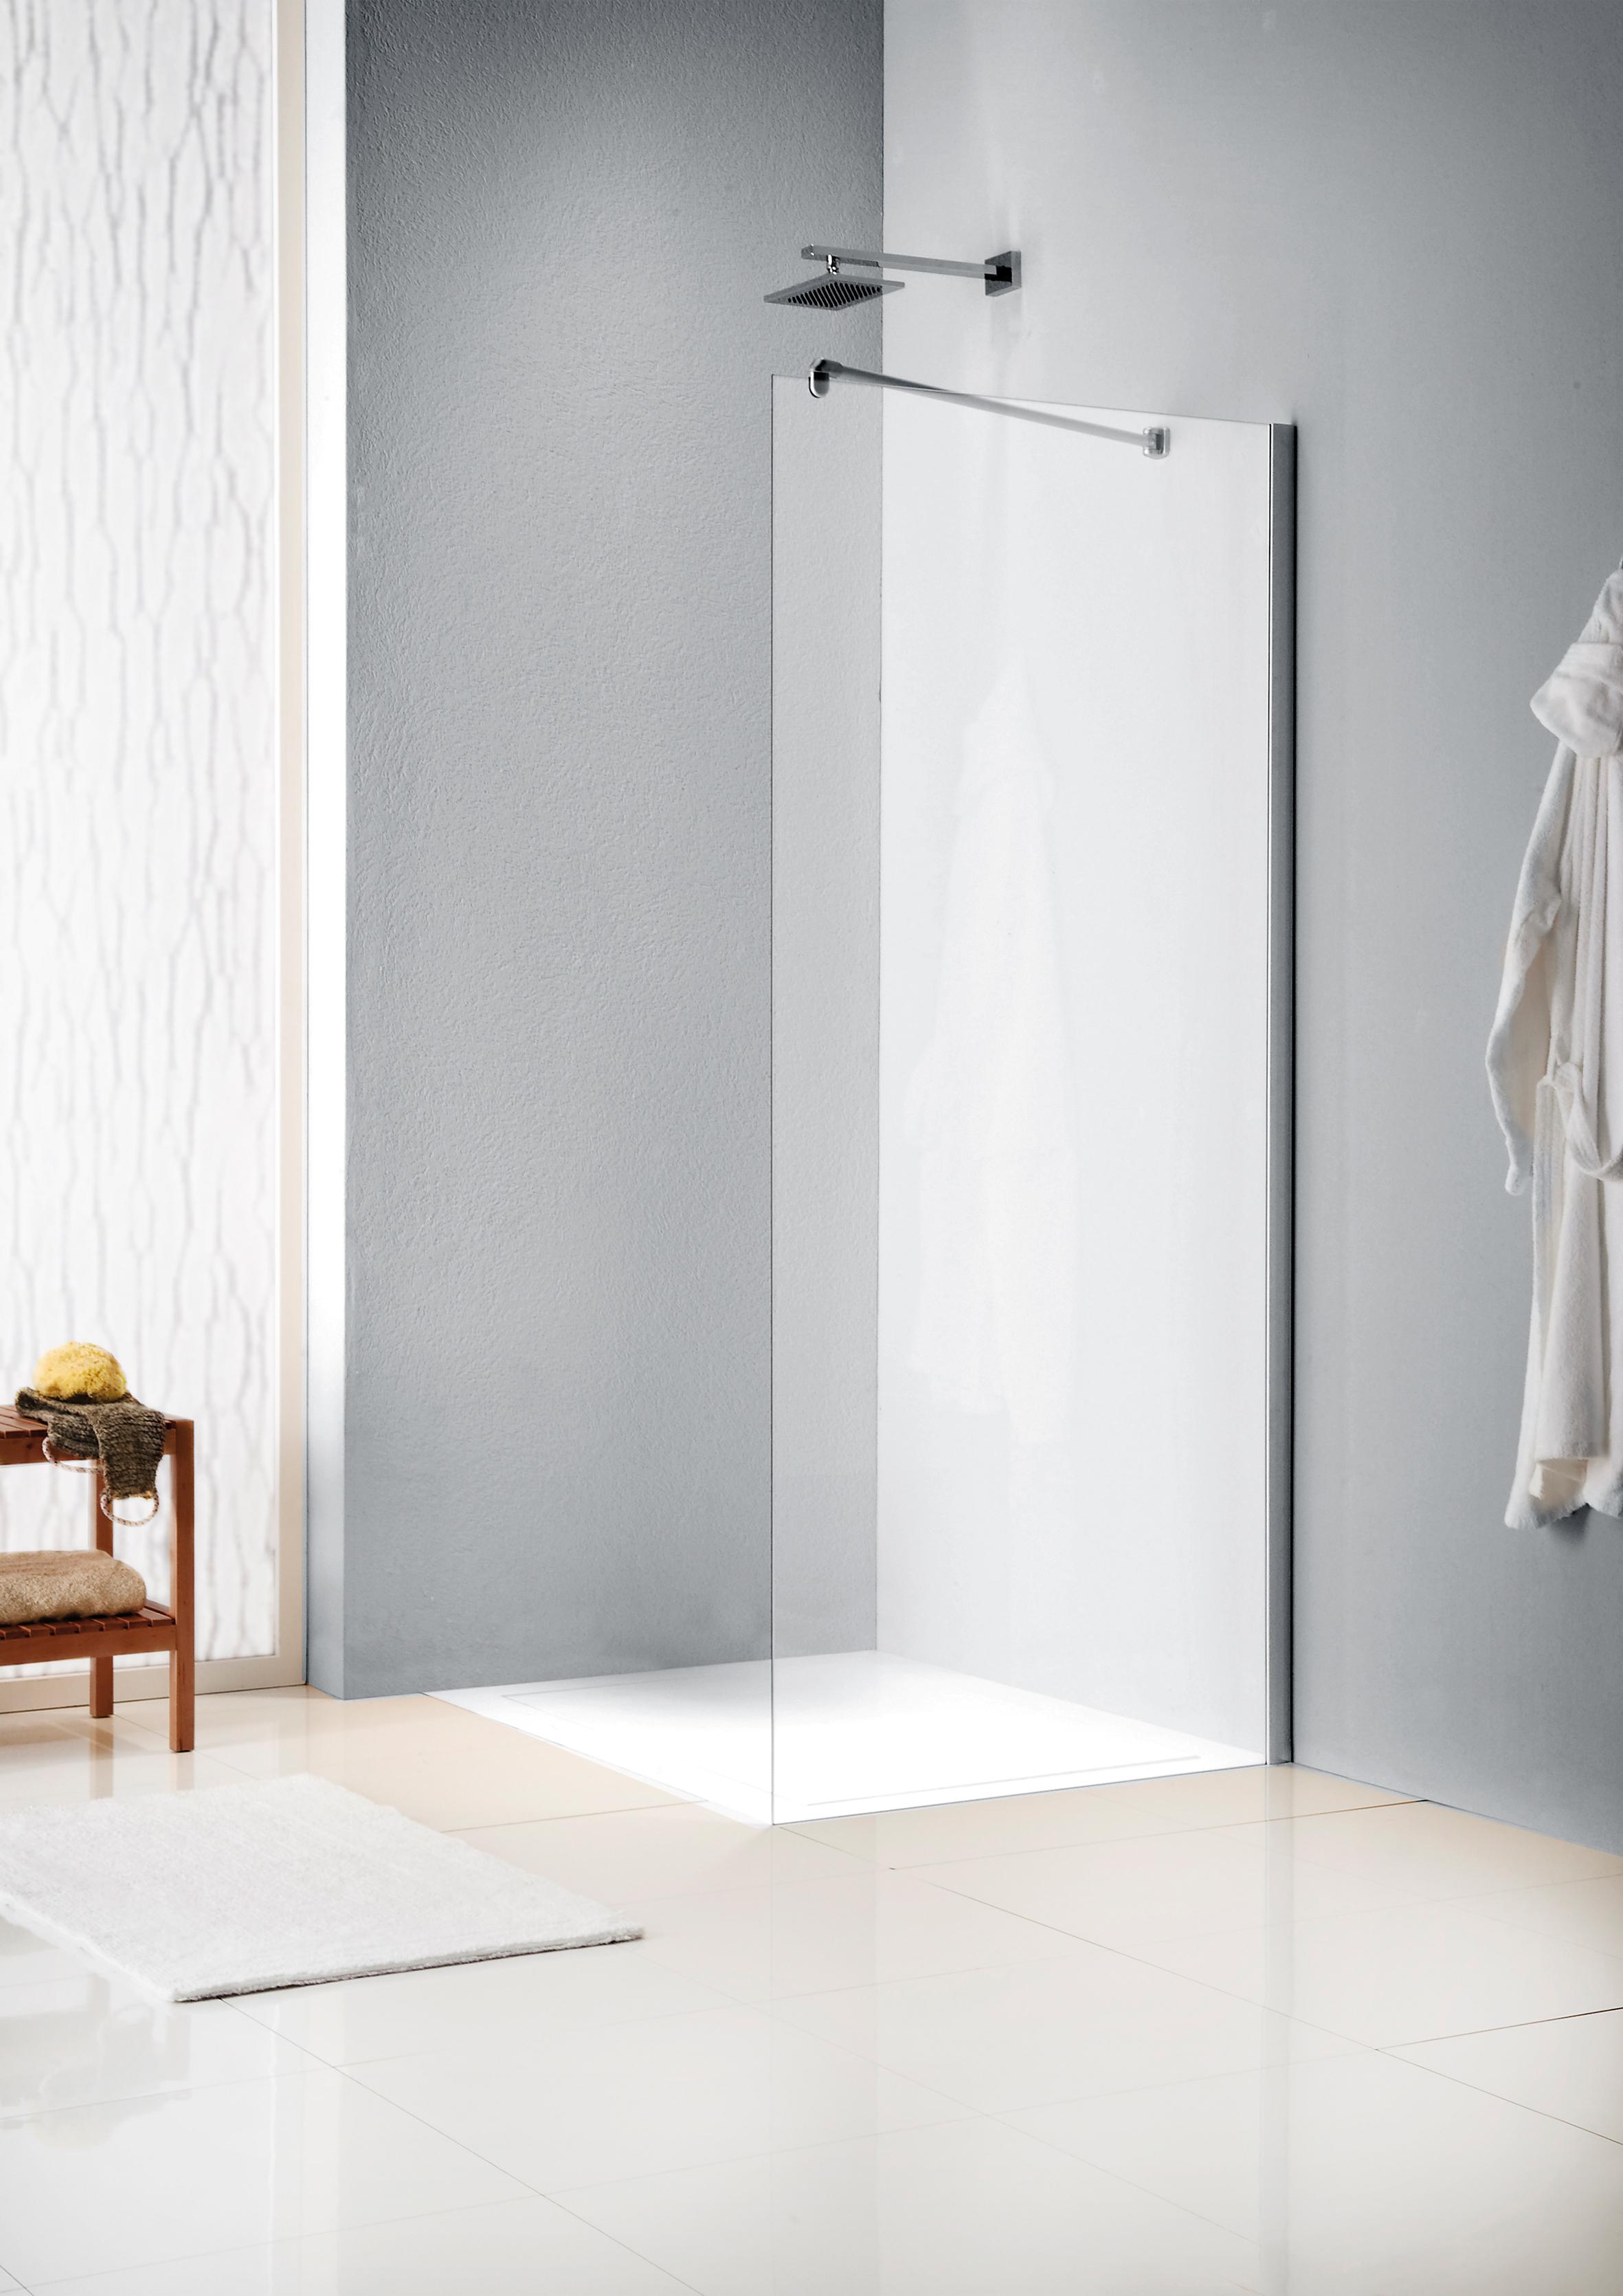 Sealskin Get Wet W205 inloopdouche 100x200cm mat zilver profiel en chinchilla glas